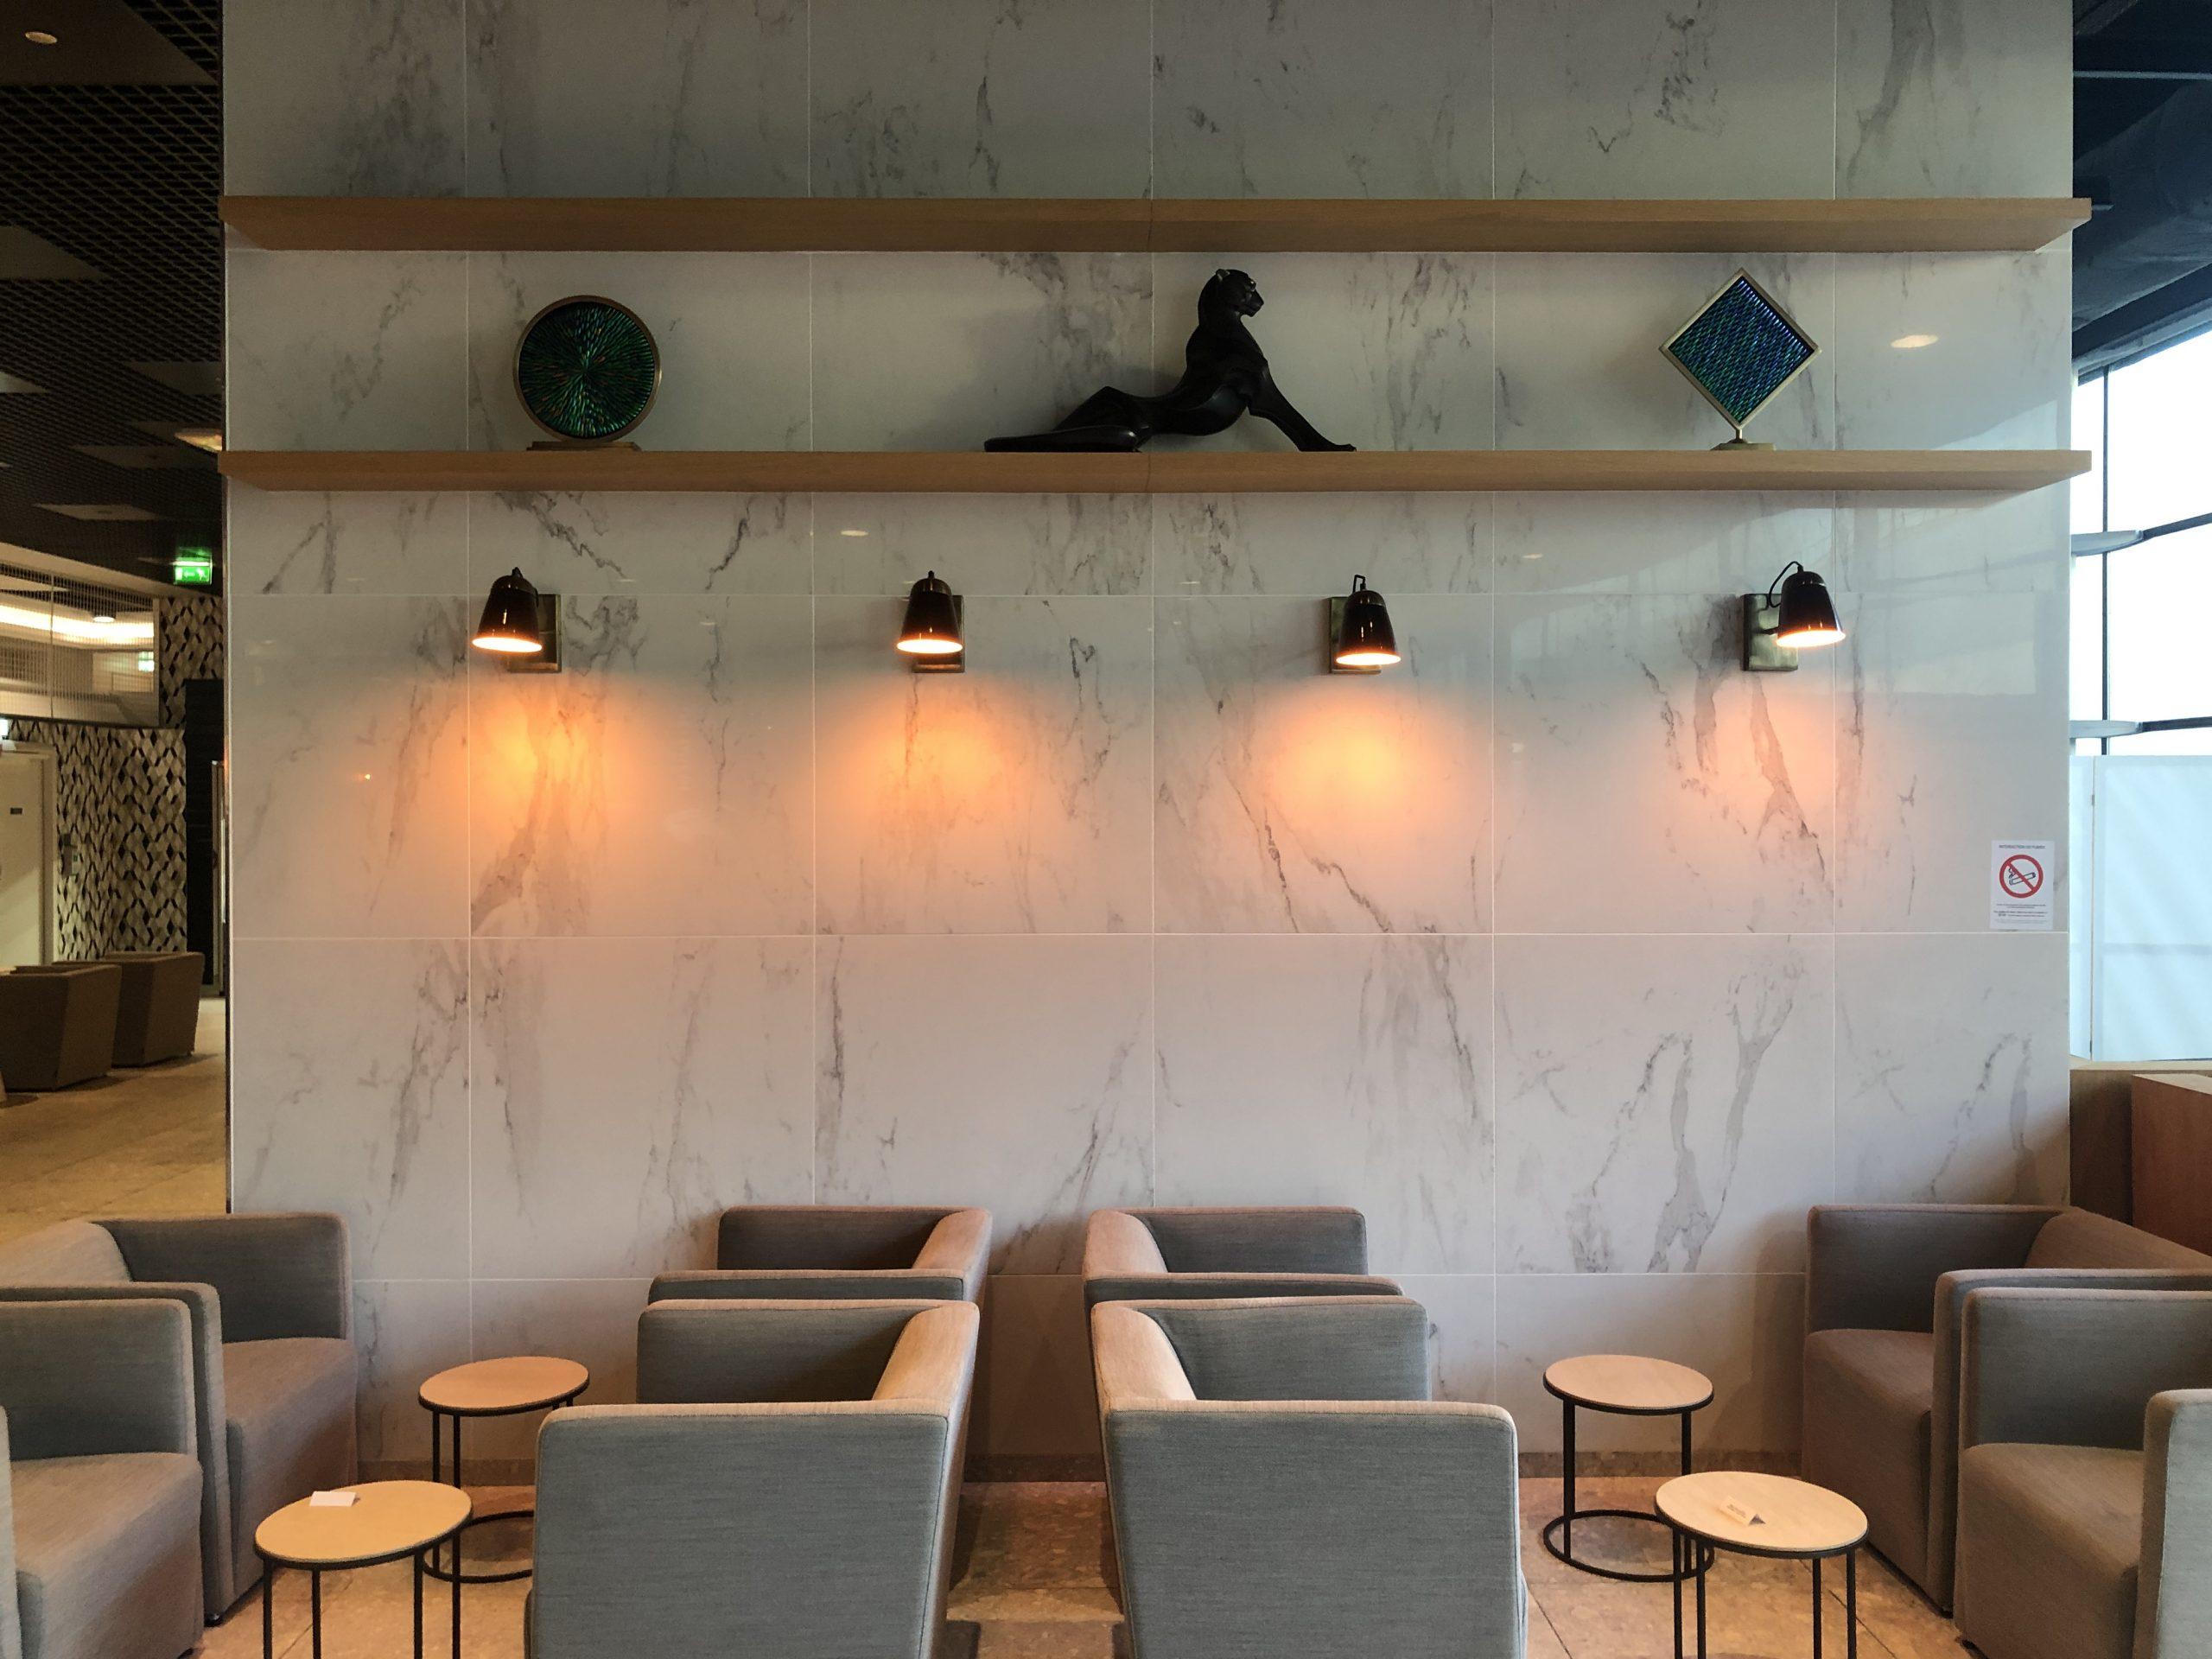 Lounge Review : パリ シャルル・ド・ゴール空港(CDG) ポールマクセンスラウンジ(Paul Maxence Lounge)